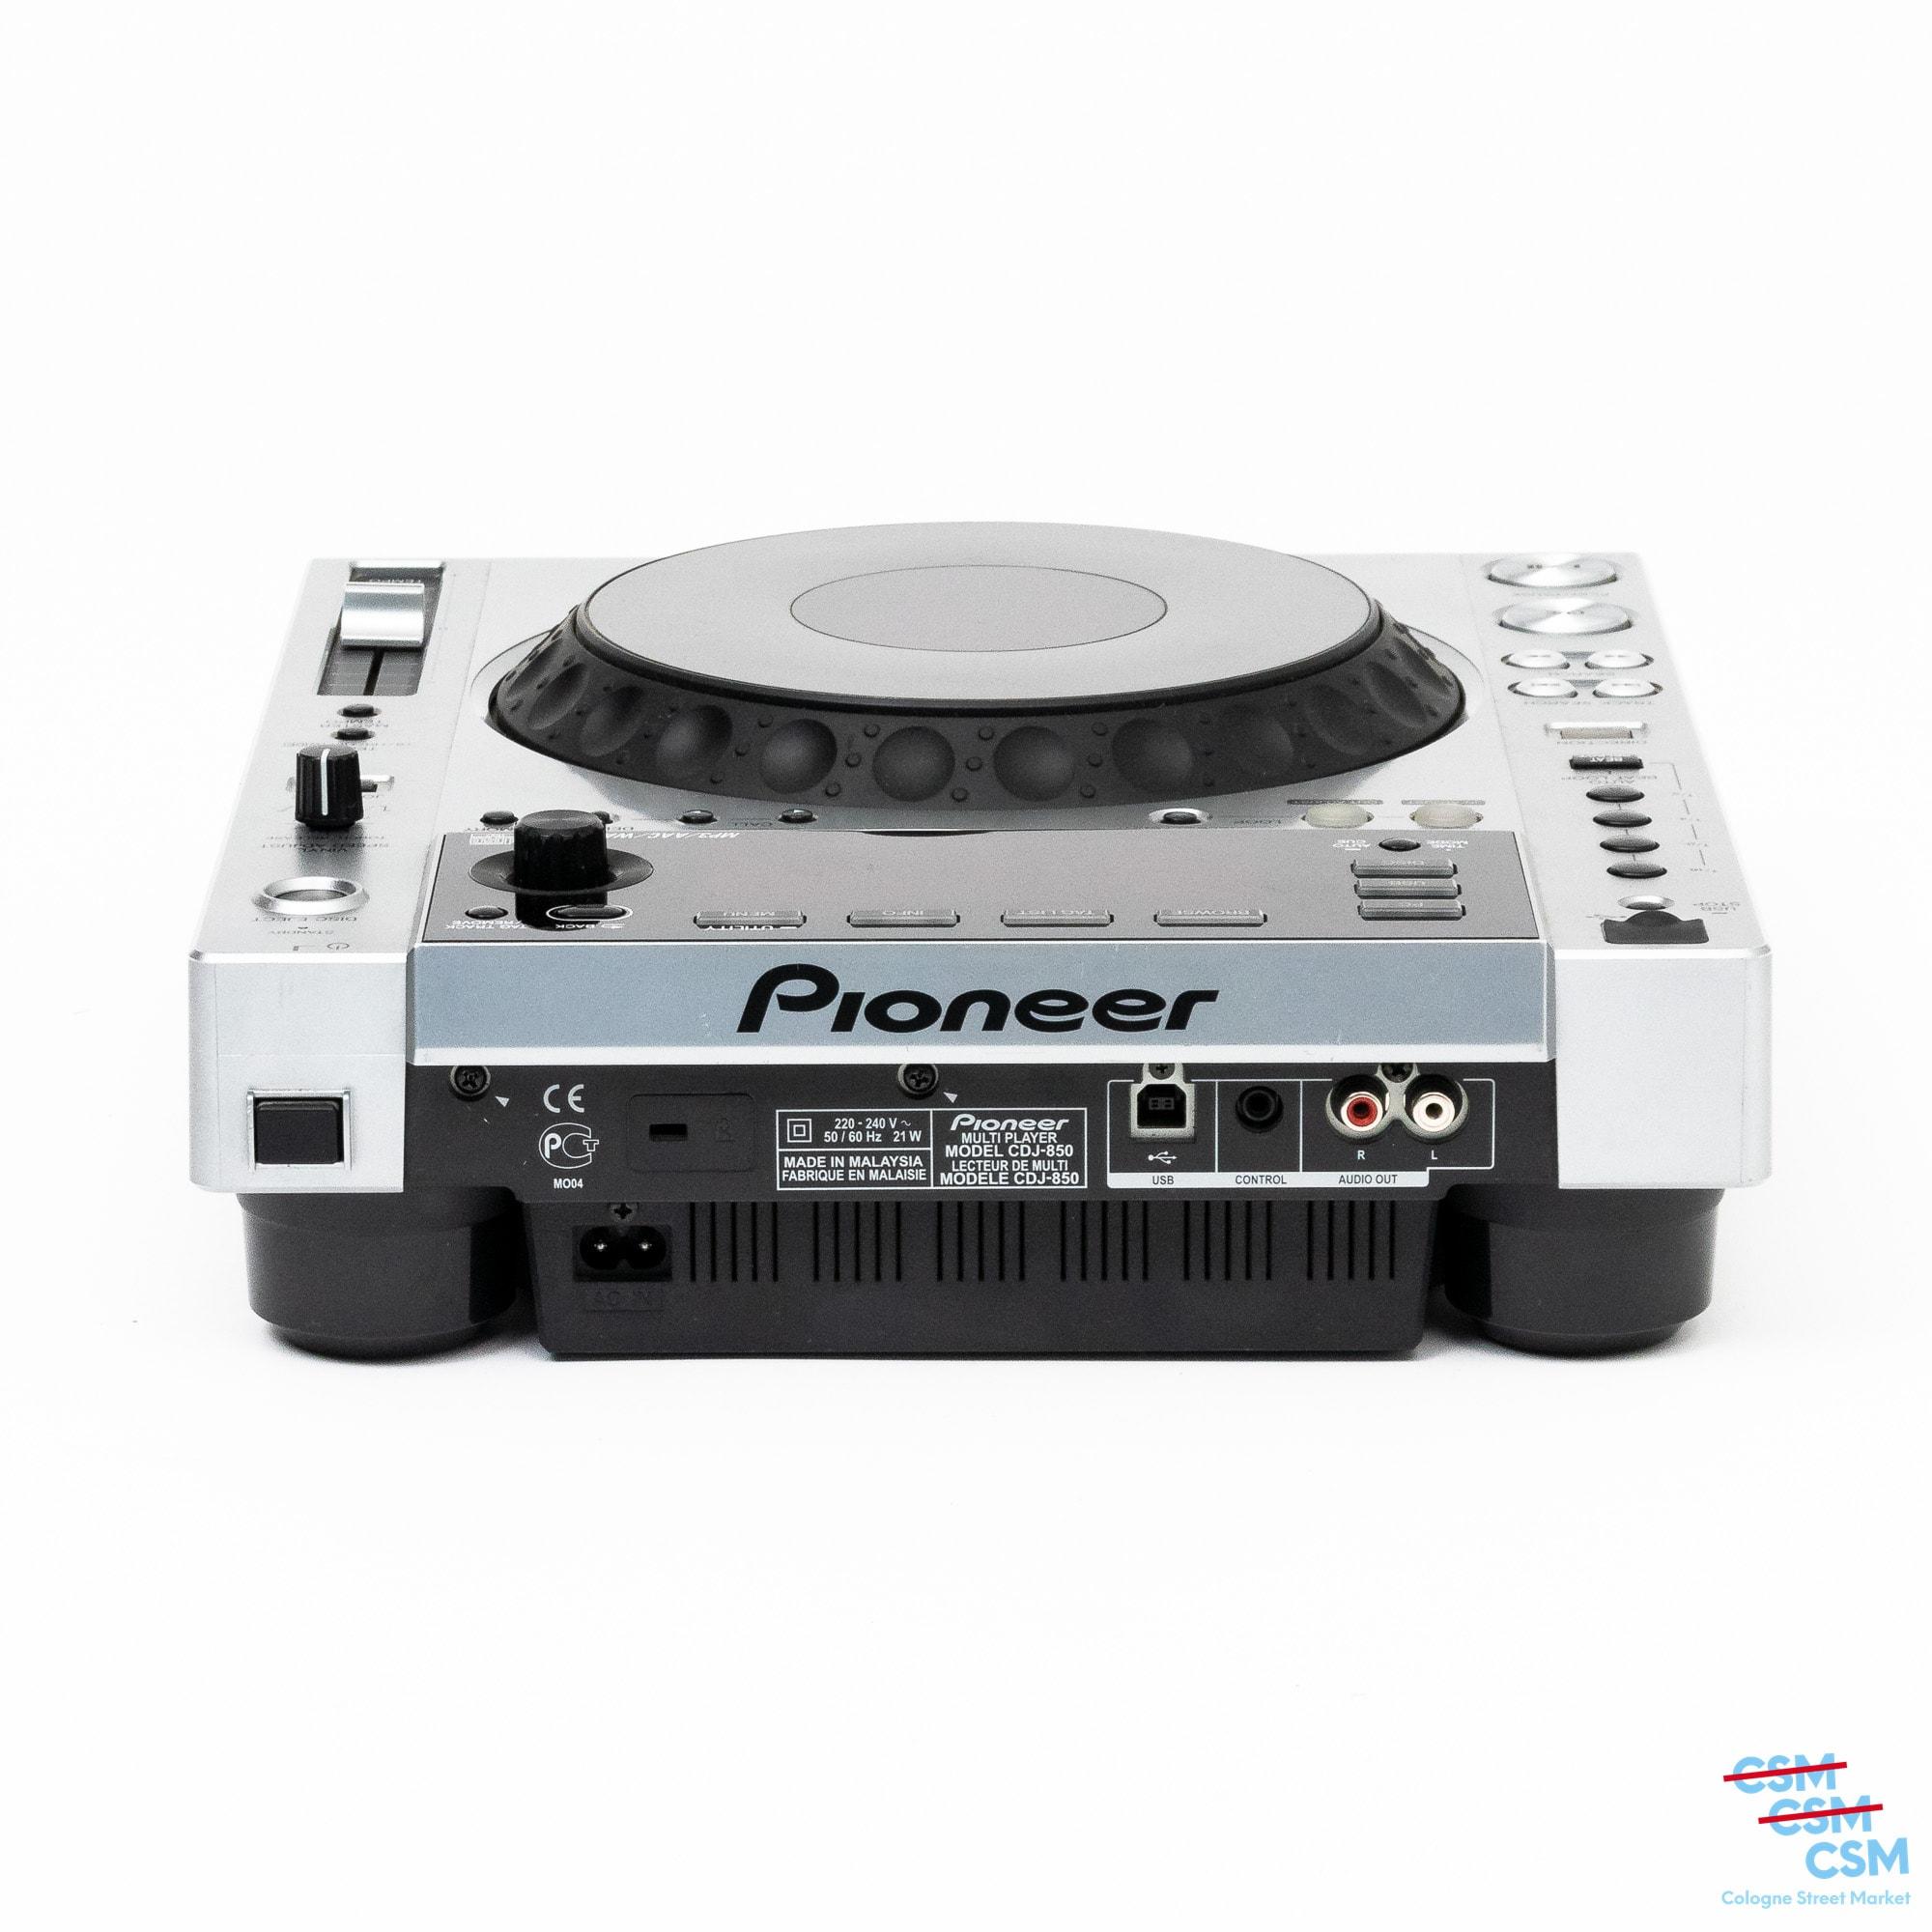 Pioneer DJ CDJ 850 Silber gebraucht 12